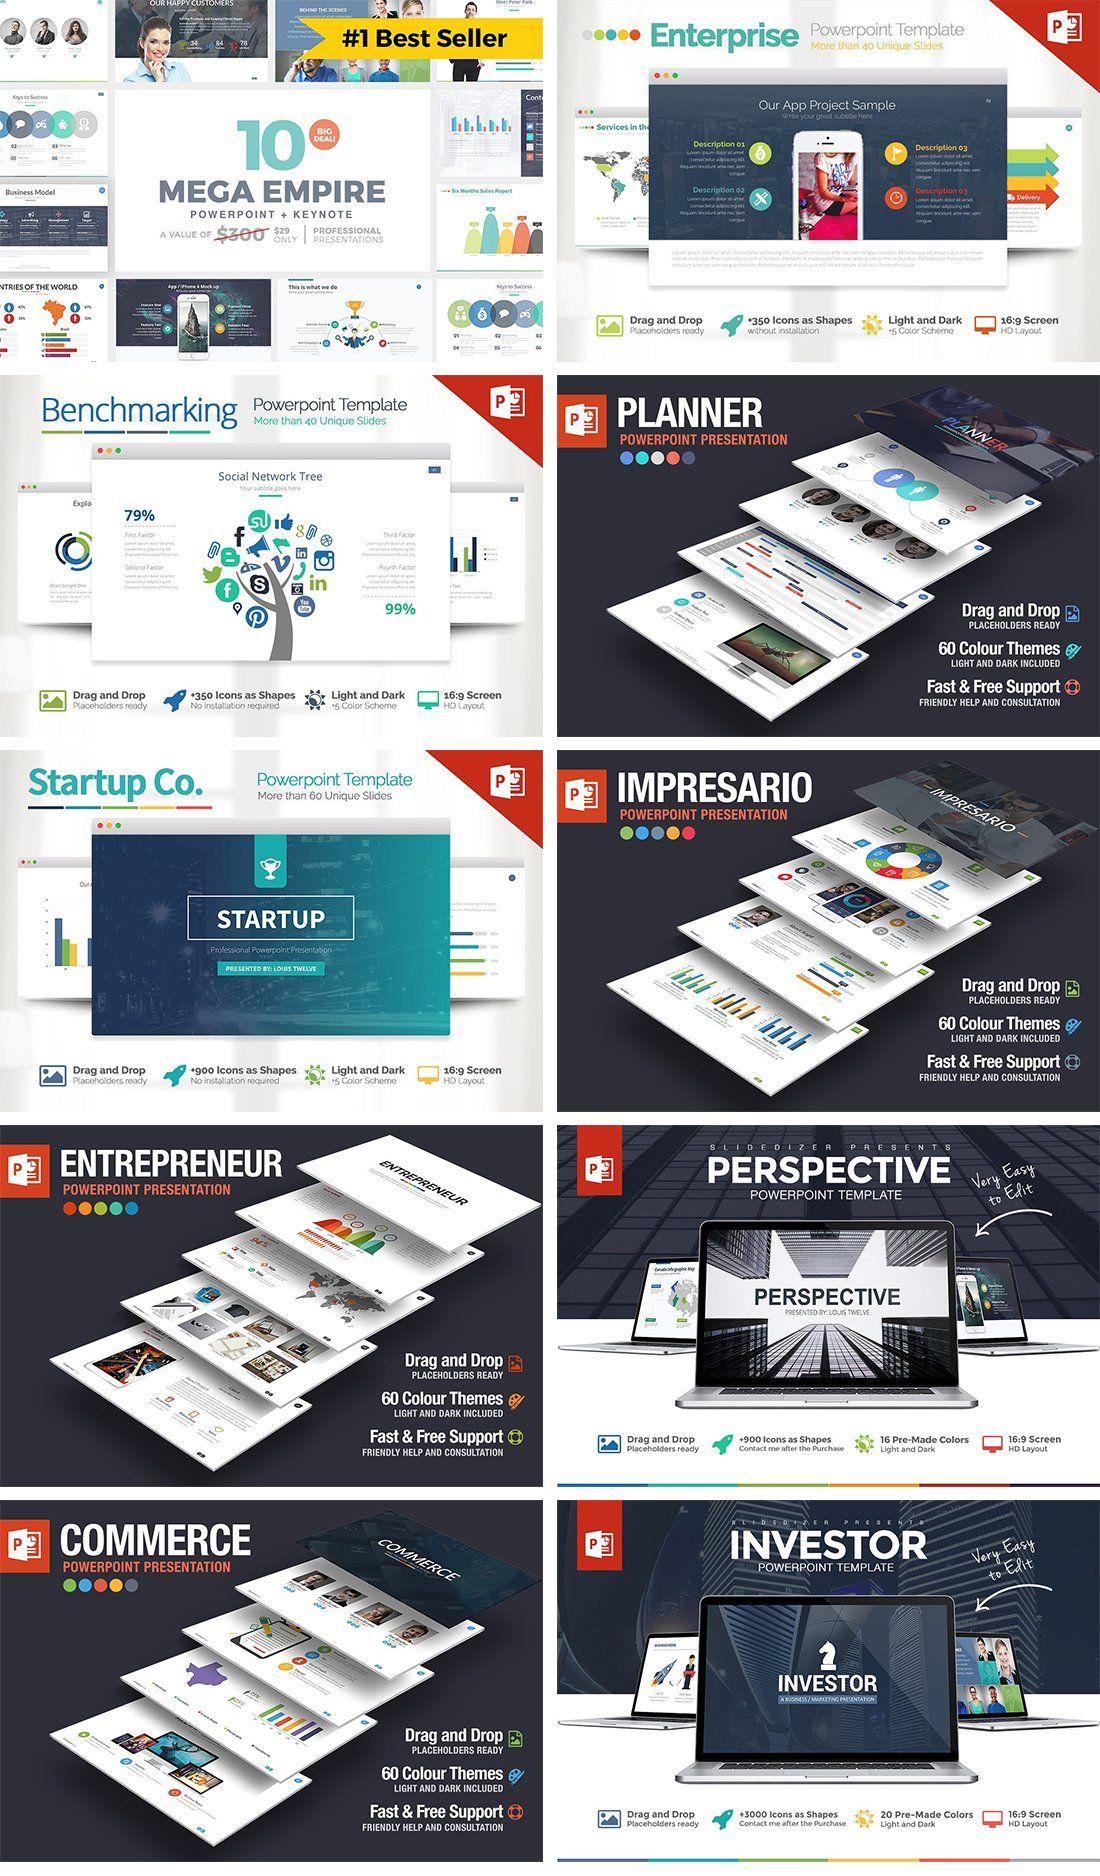 IMPERIO Powerpoint + Keynote + Google Slides Templates